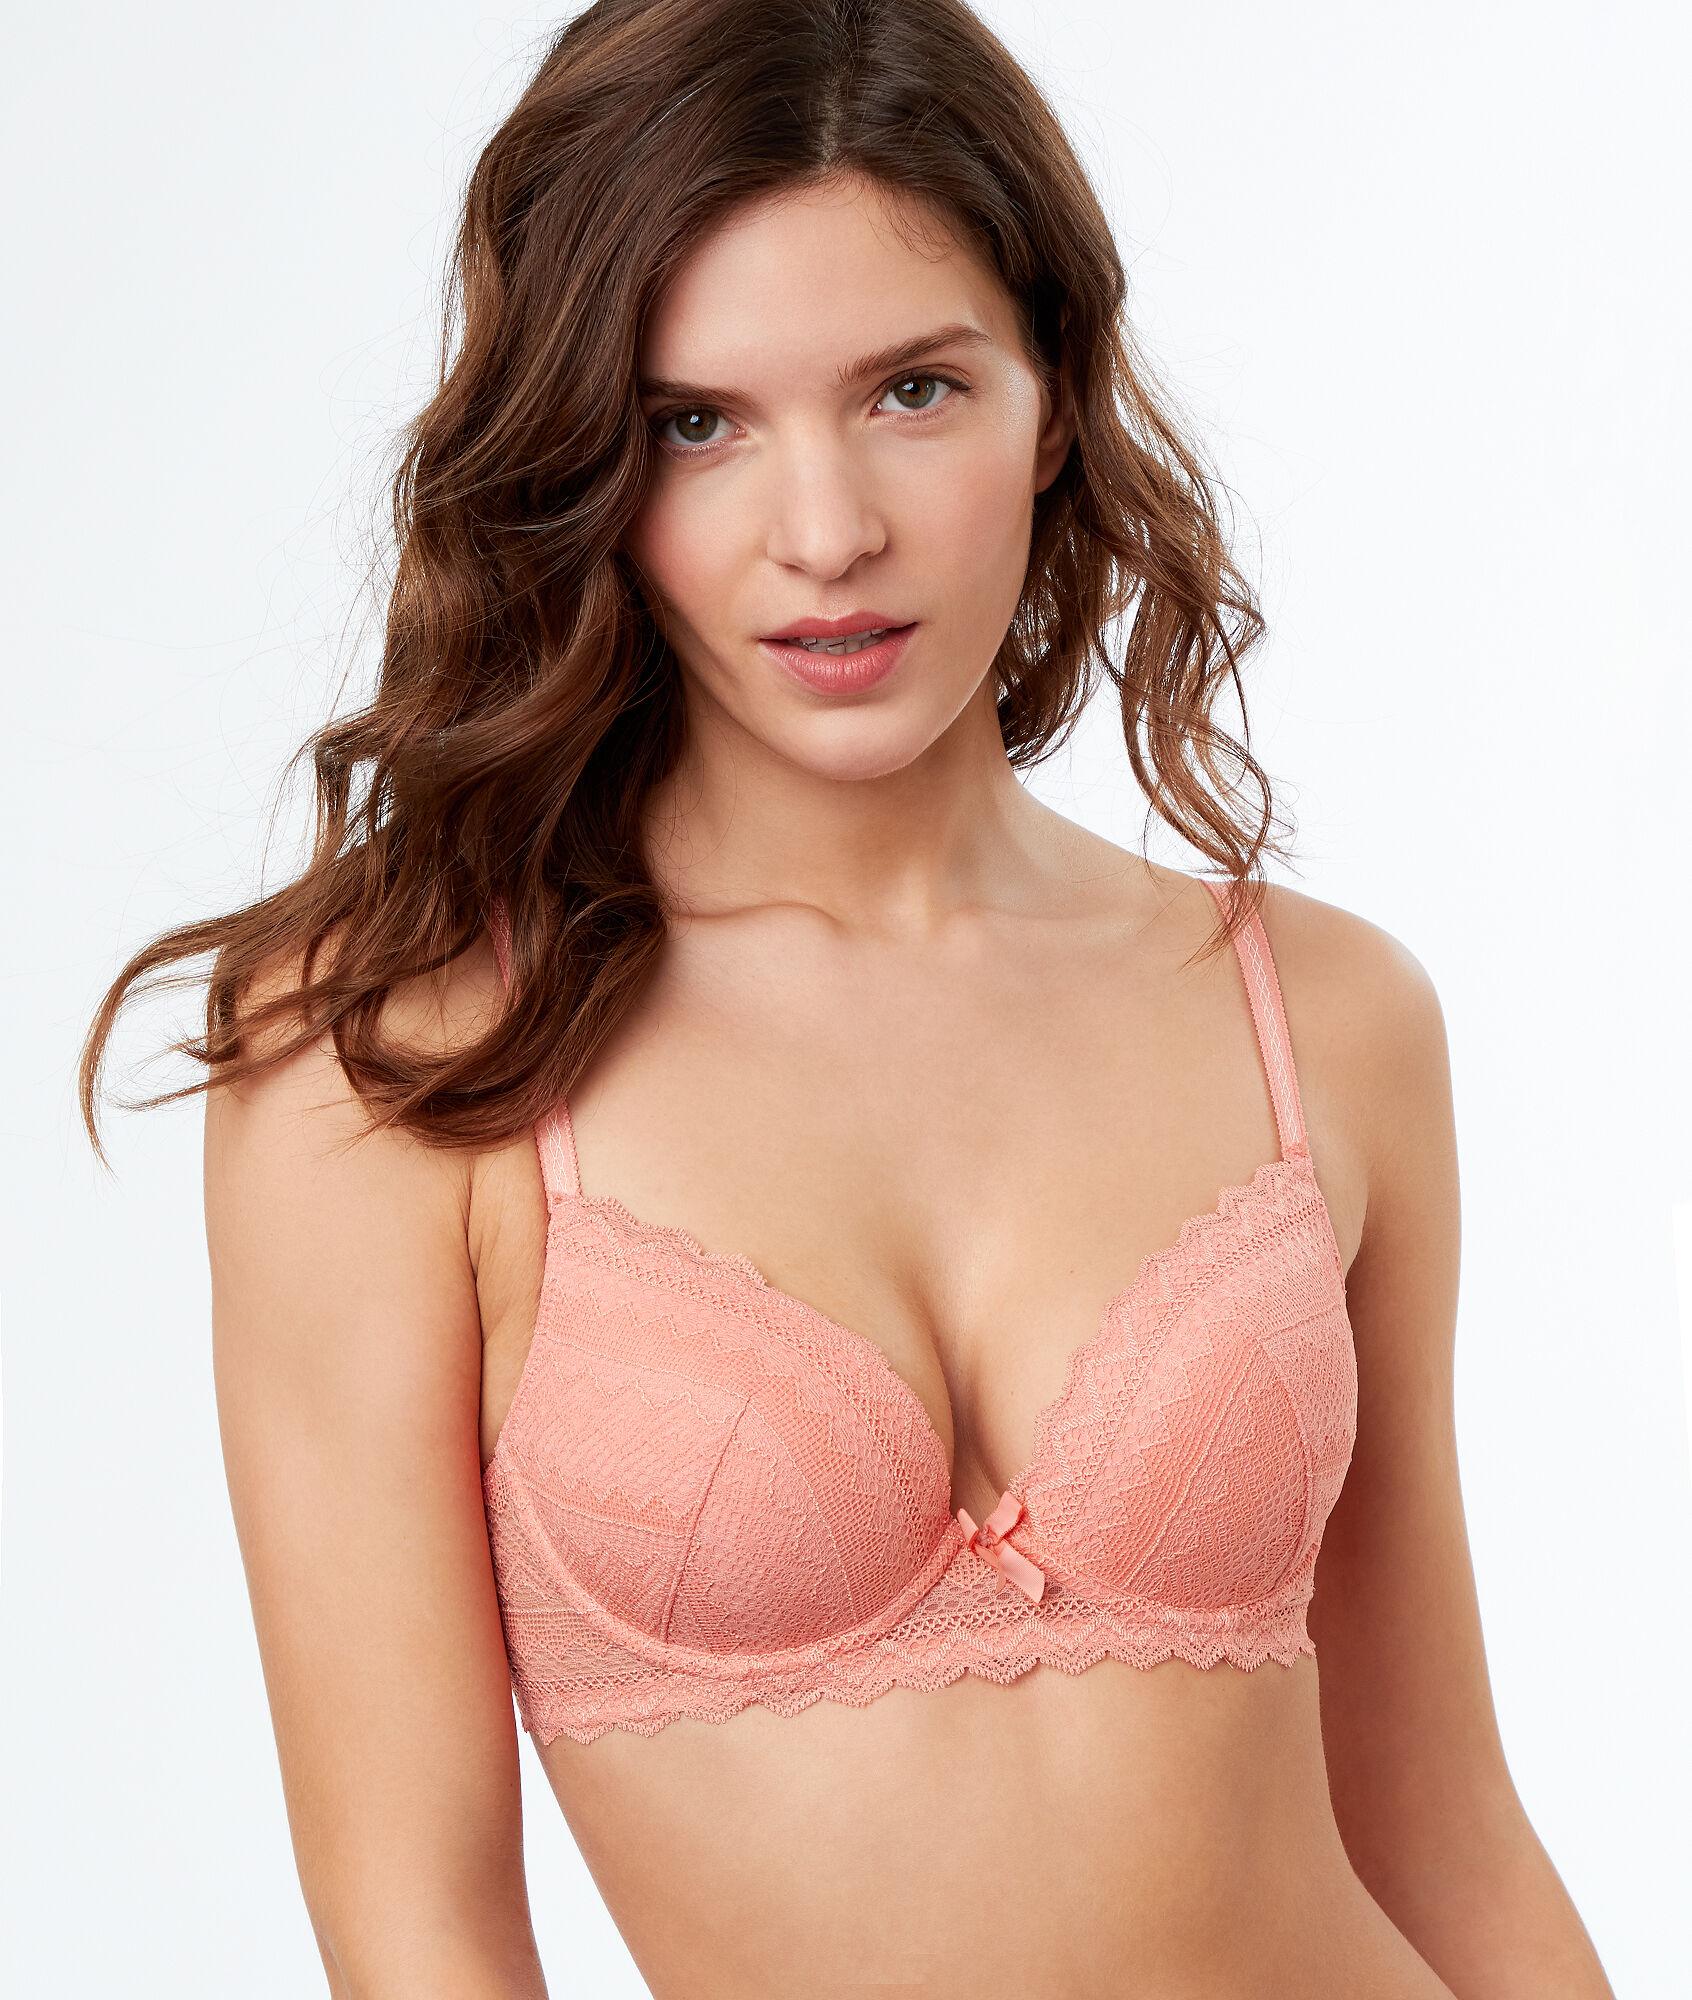 949bbf910d789 Bra No. 1 - Lace push-up bra - Etam